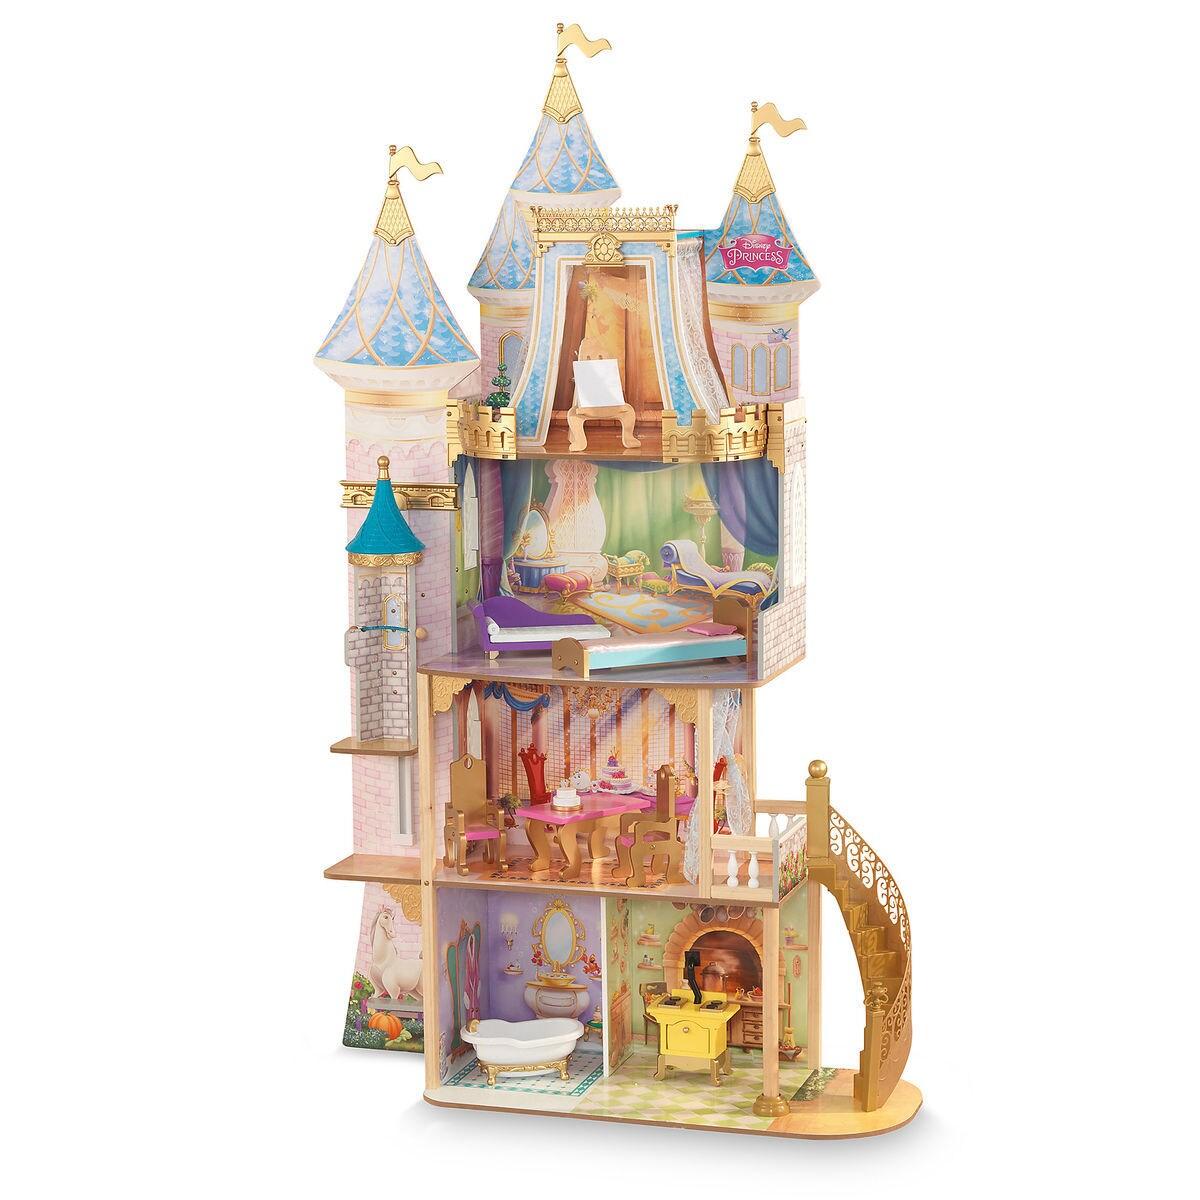 3dc90f67b8 Product Image of Disney Princess Royal Celebration Dollhouse by KidKraft   1